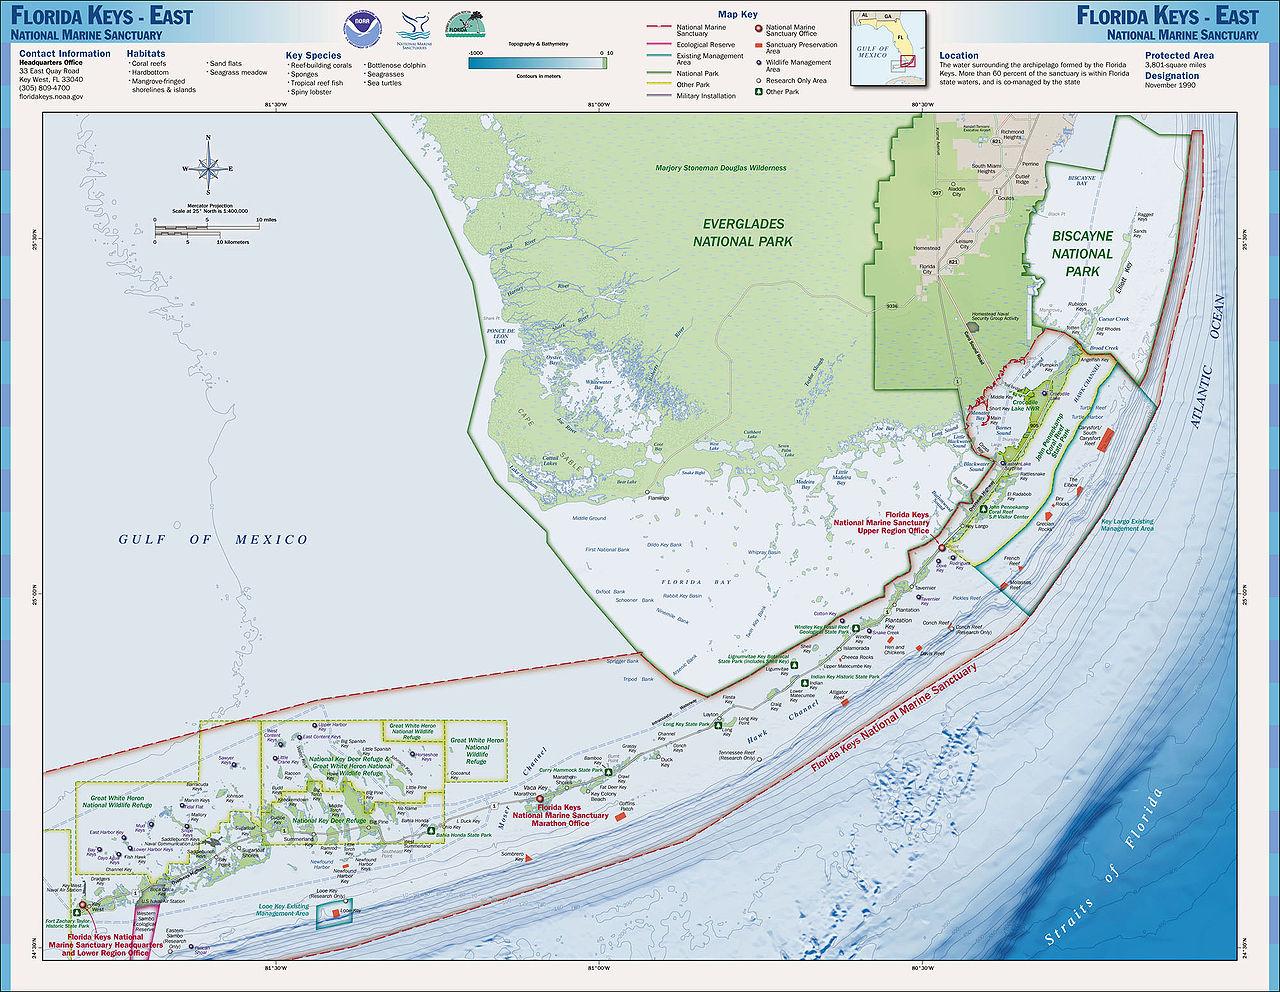 Charts And Maps Florida Keys - Florida Go Fishing - Map Of Florida Keys And Miami